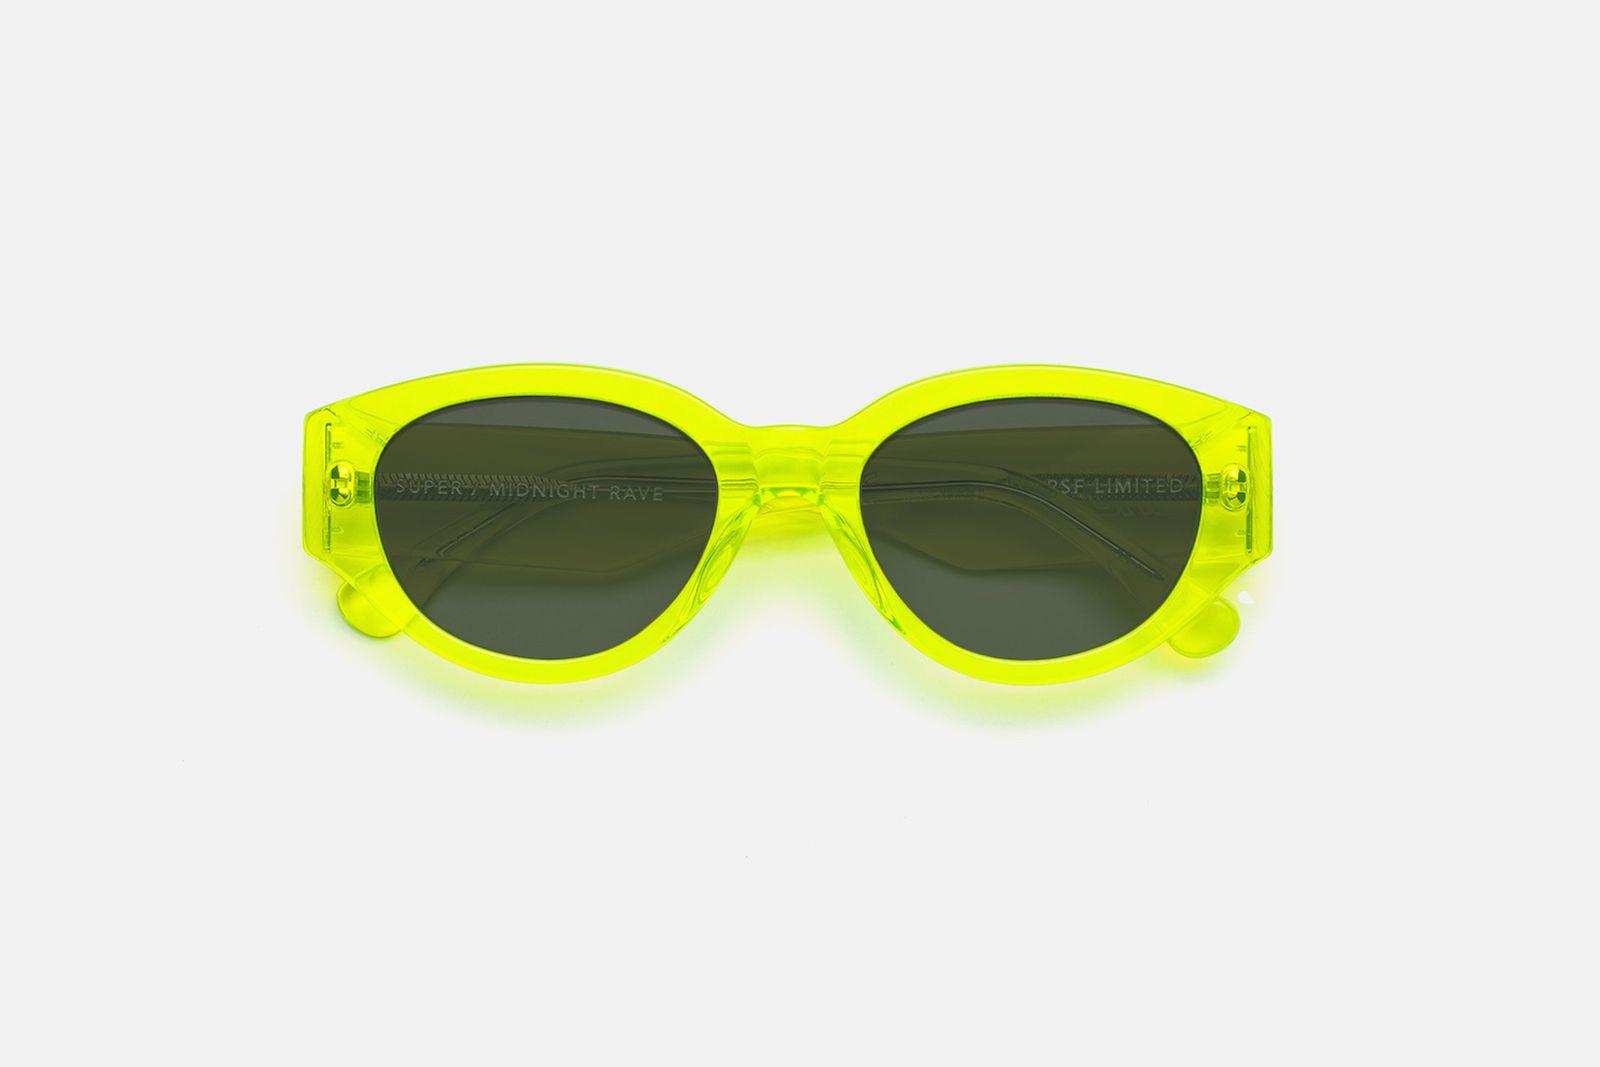 retrosuperfuture midnight rave sunglasses SUPER by Retrosuperfuture